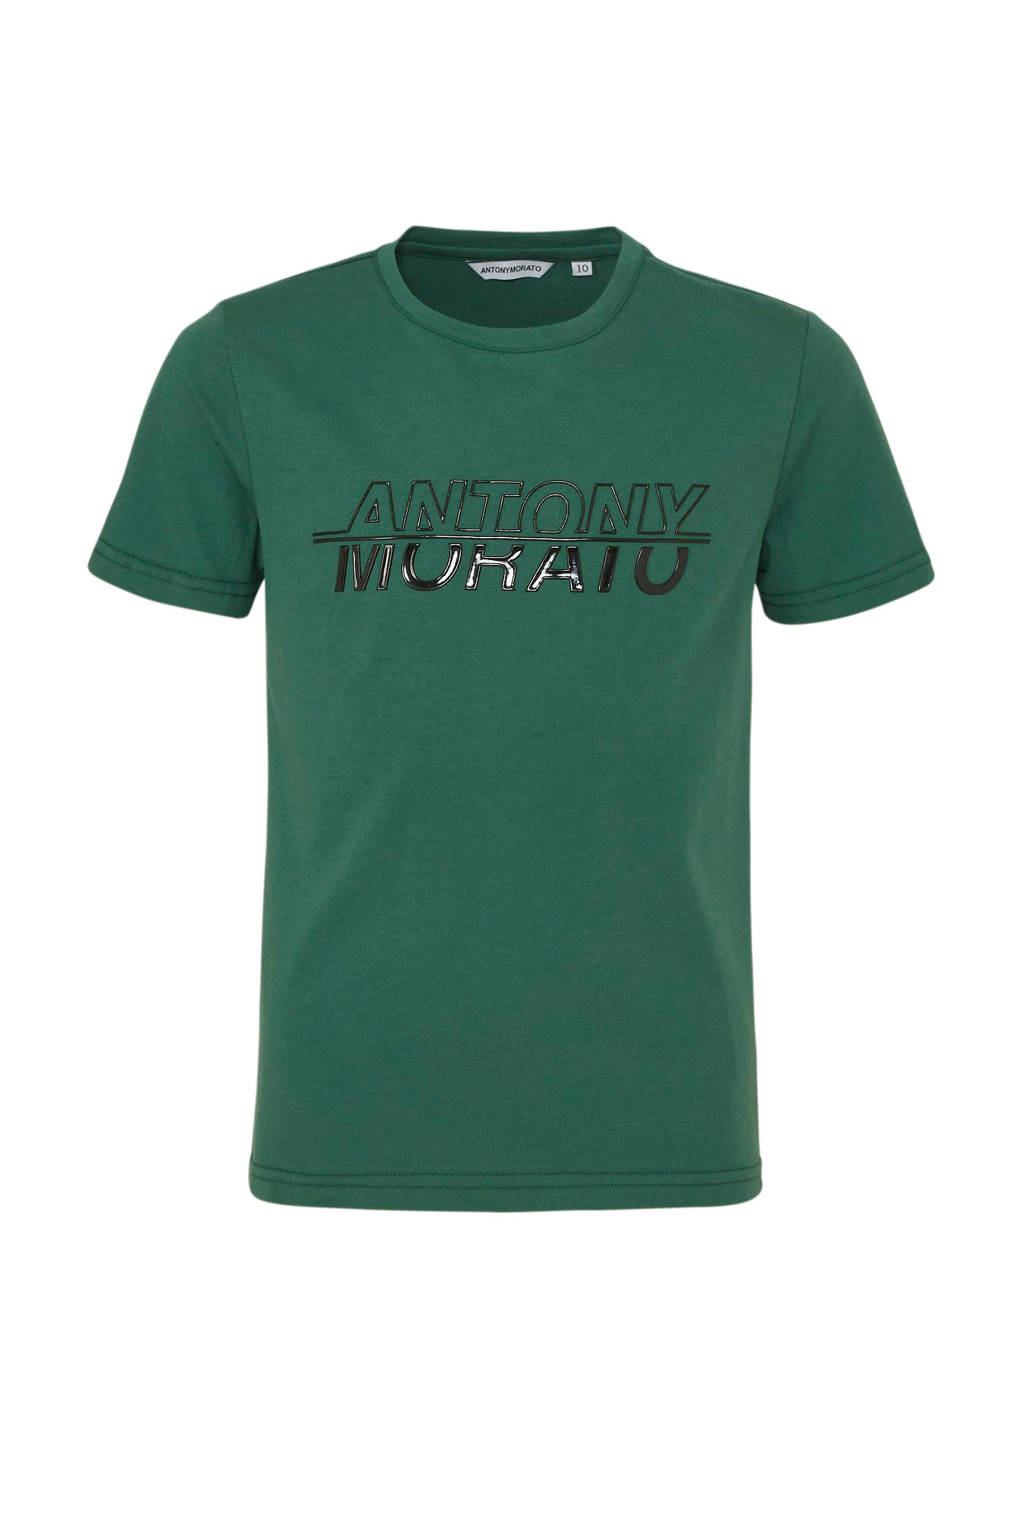 Antony Morato T-shirt met logo donkergroen/zwart, Donkergroen/zwart